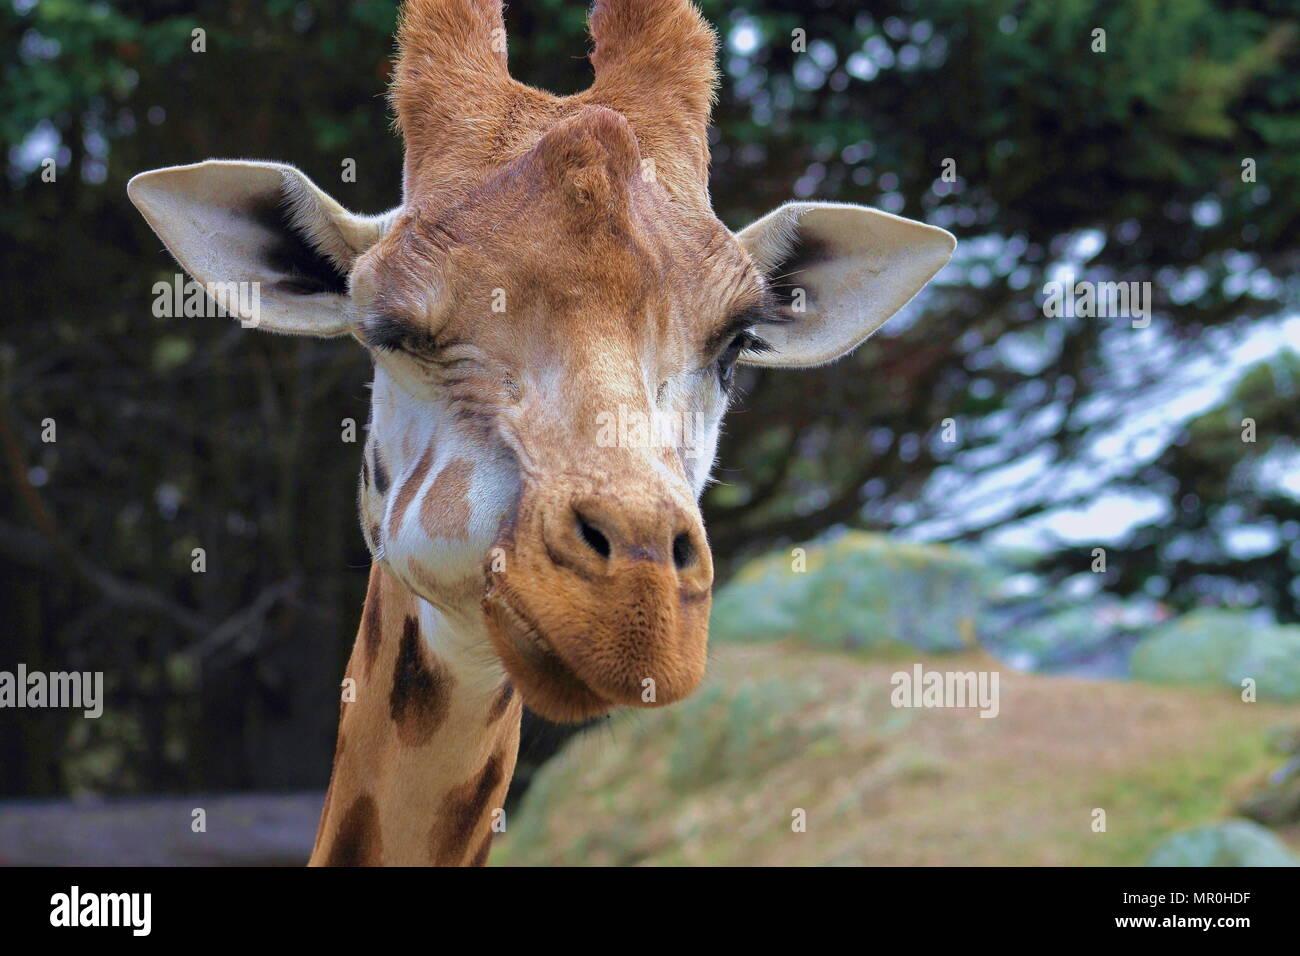 Gros plan d'une Girafe (Giraffa camelopardalis) winking Banque D'Images